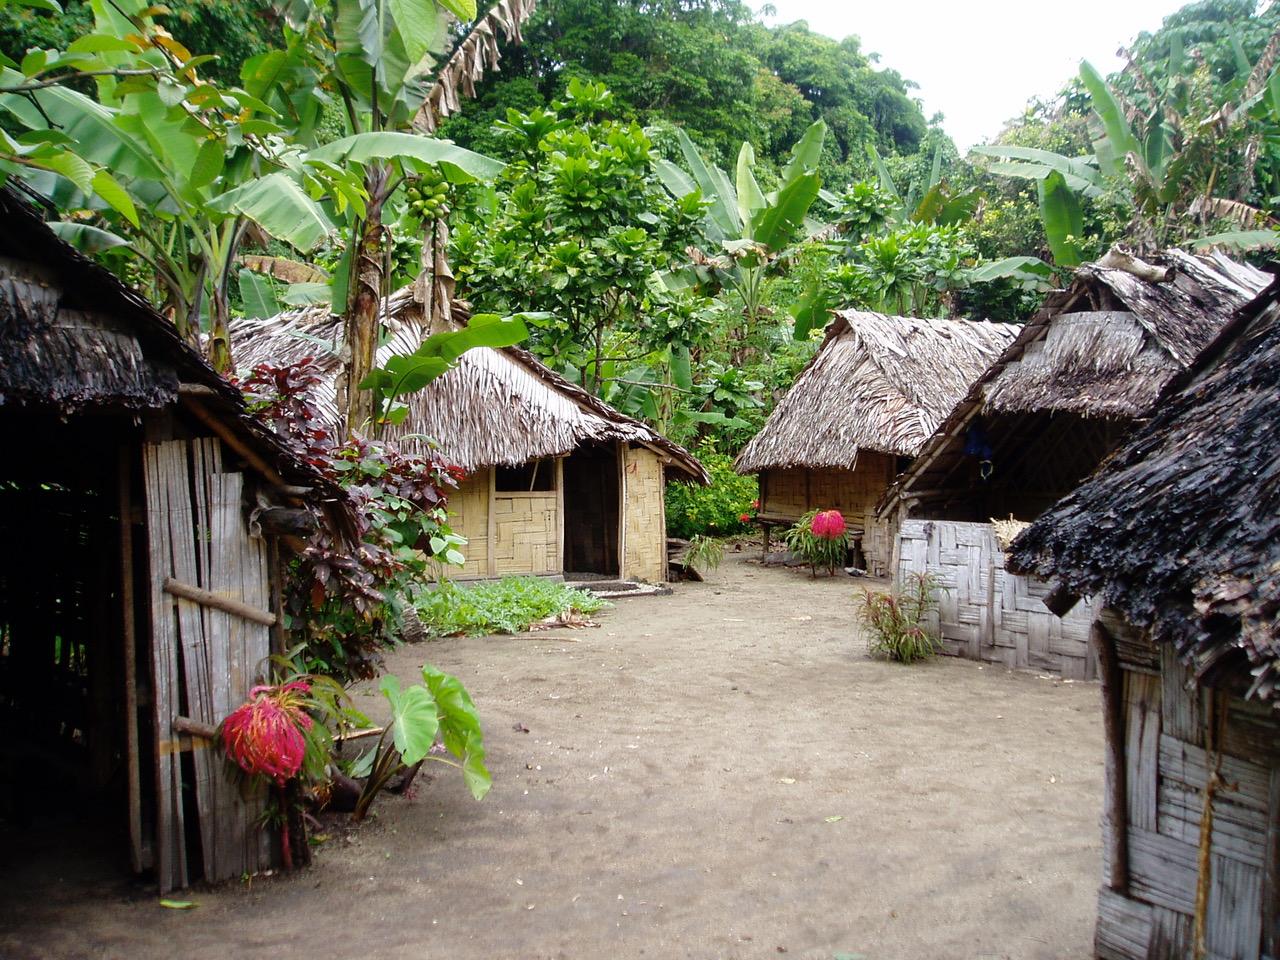 Village on Toman Island photographer: Anastasia Riehl